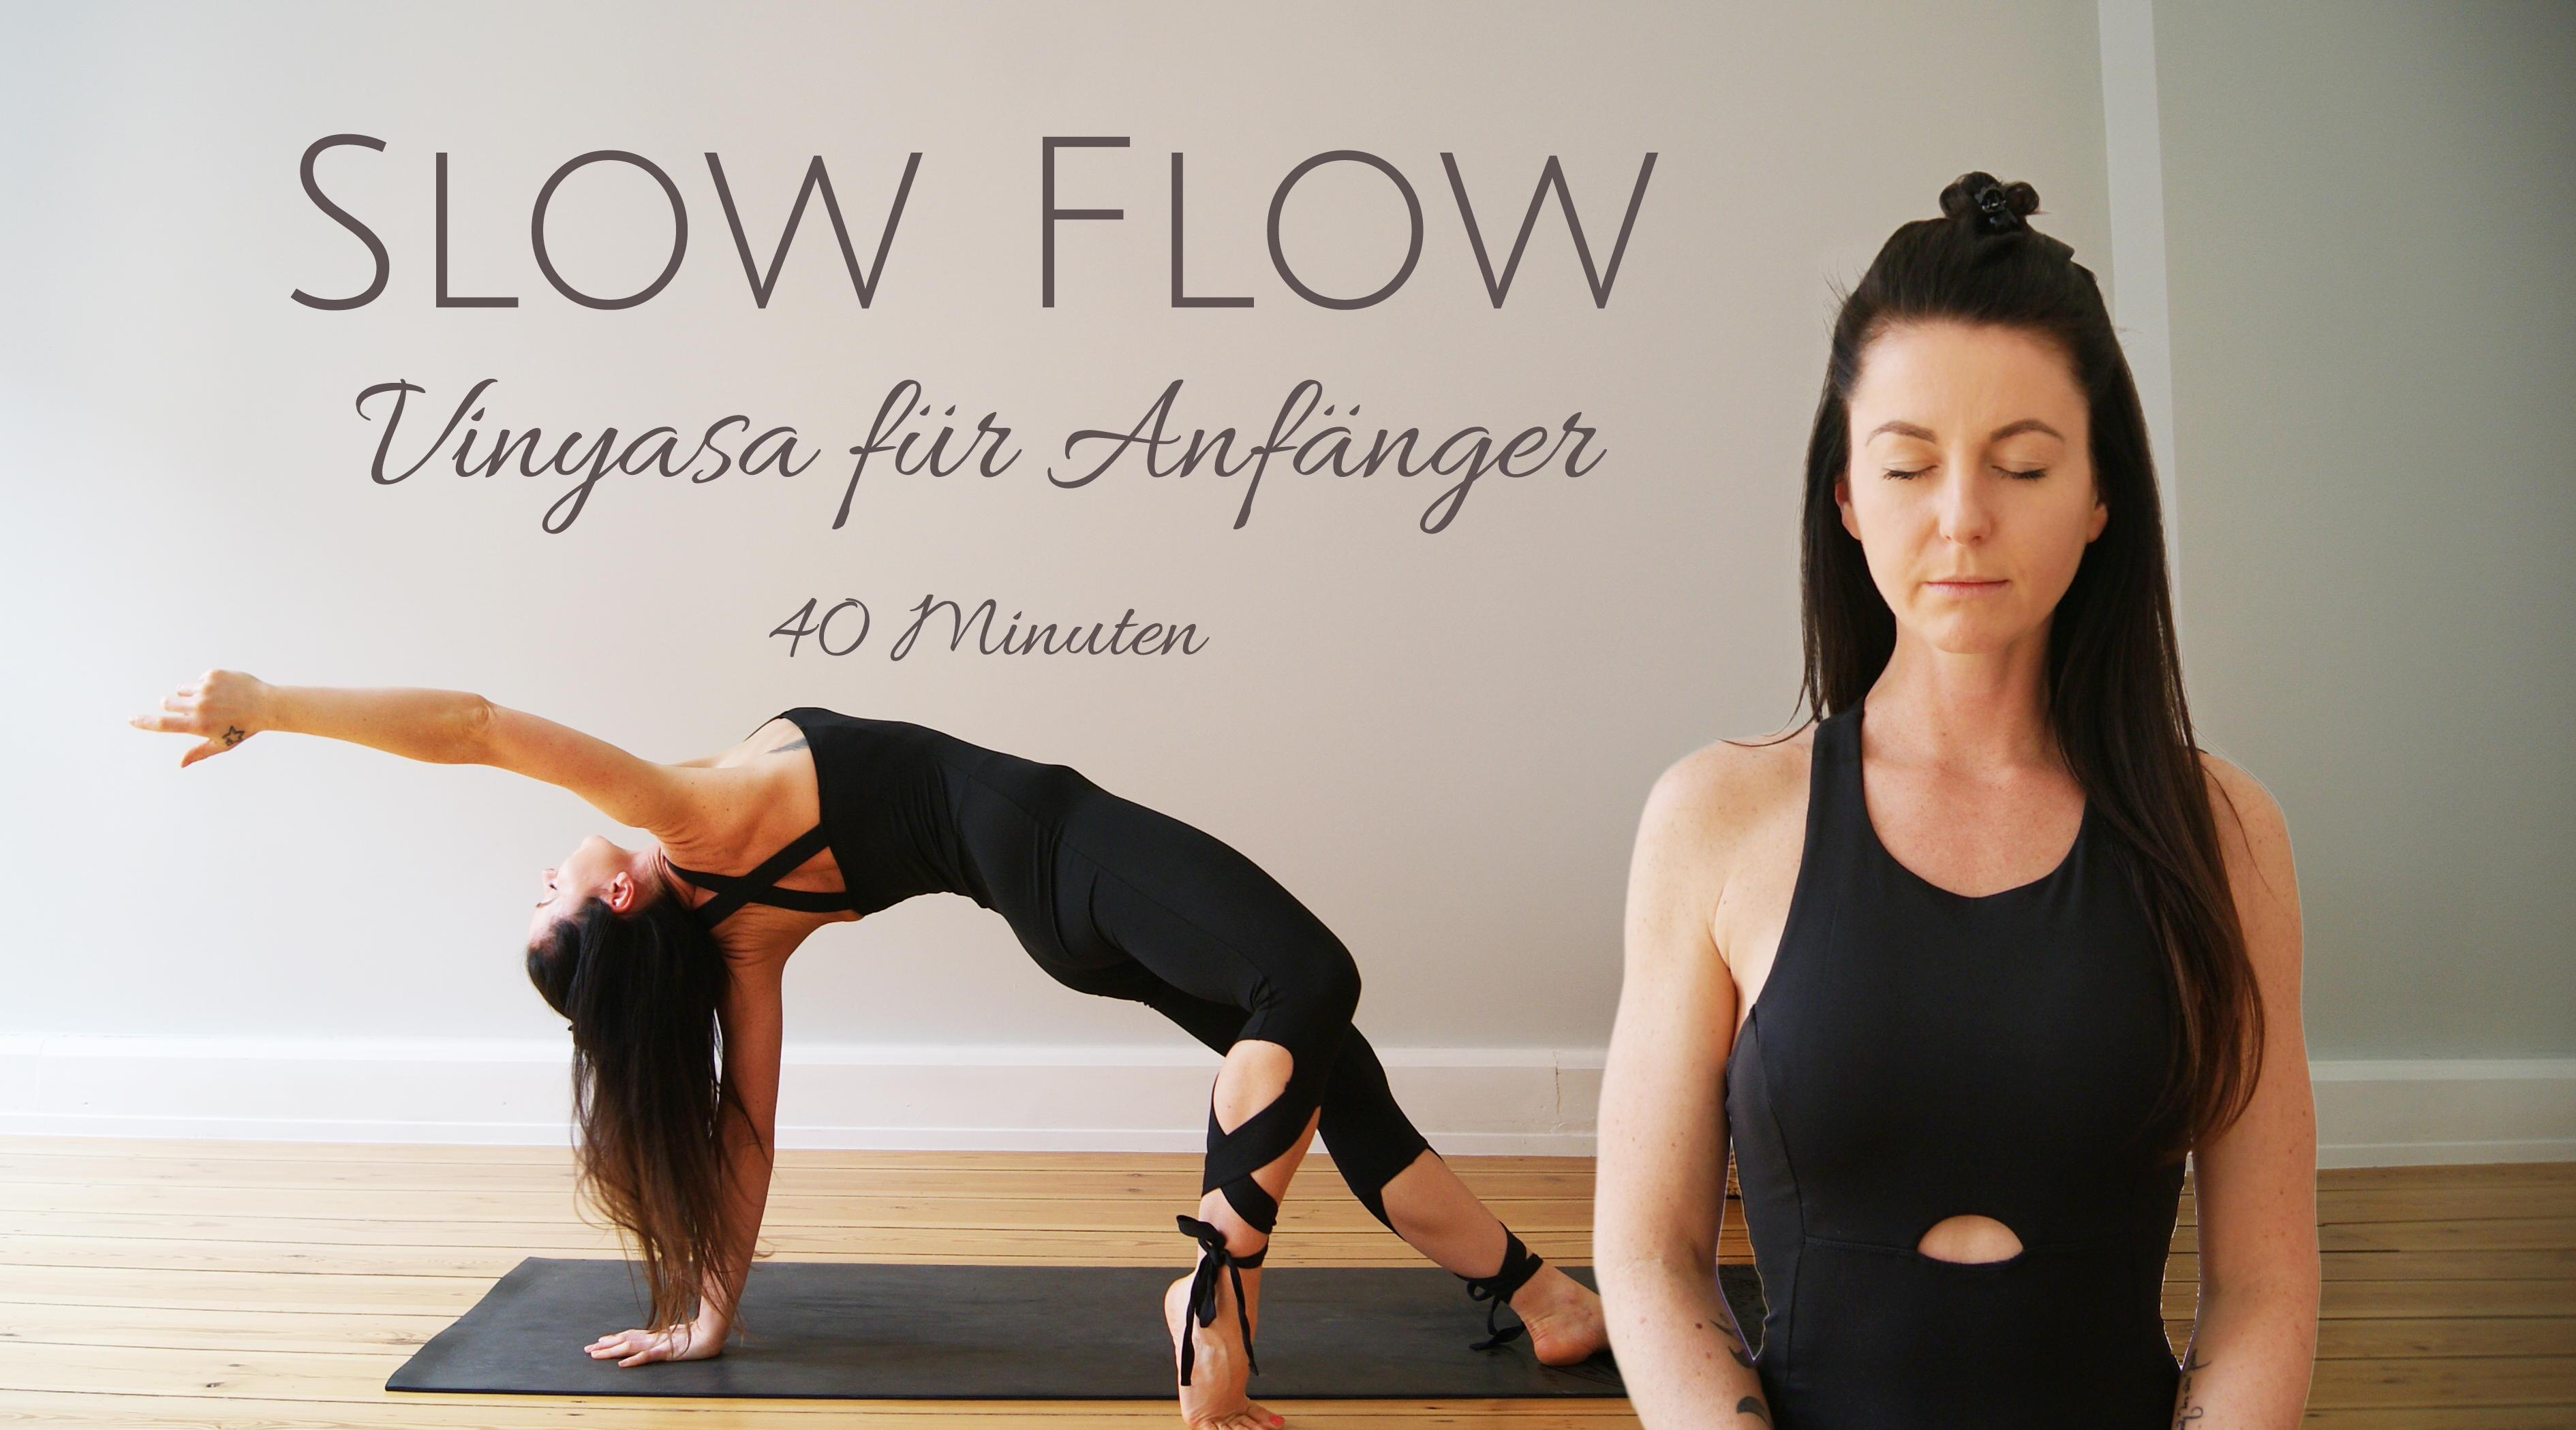 Slow Flow │ Vinyasa Flow für Anfänger │ 40 Minuten │Yoga Workout